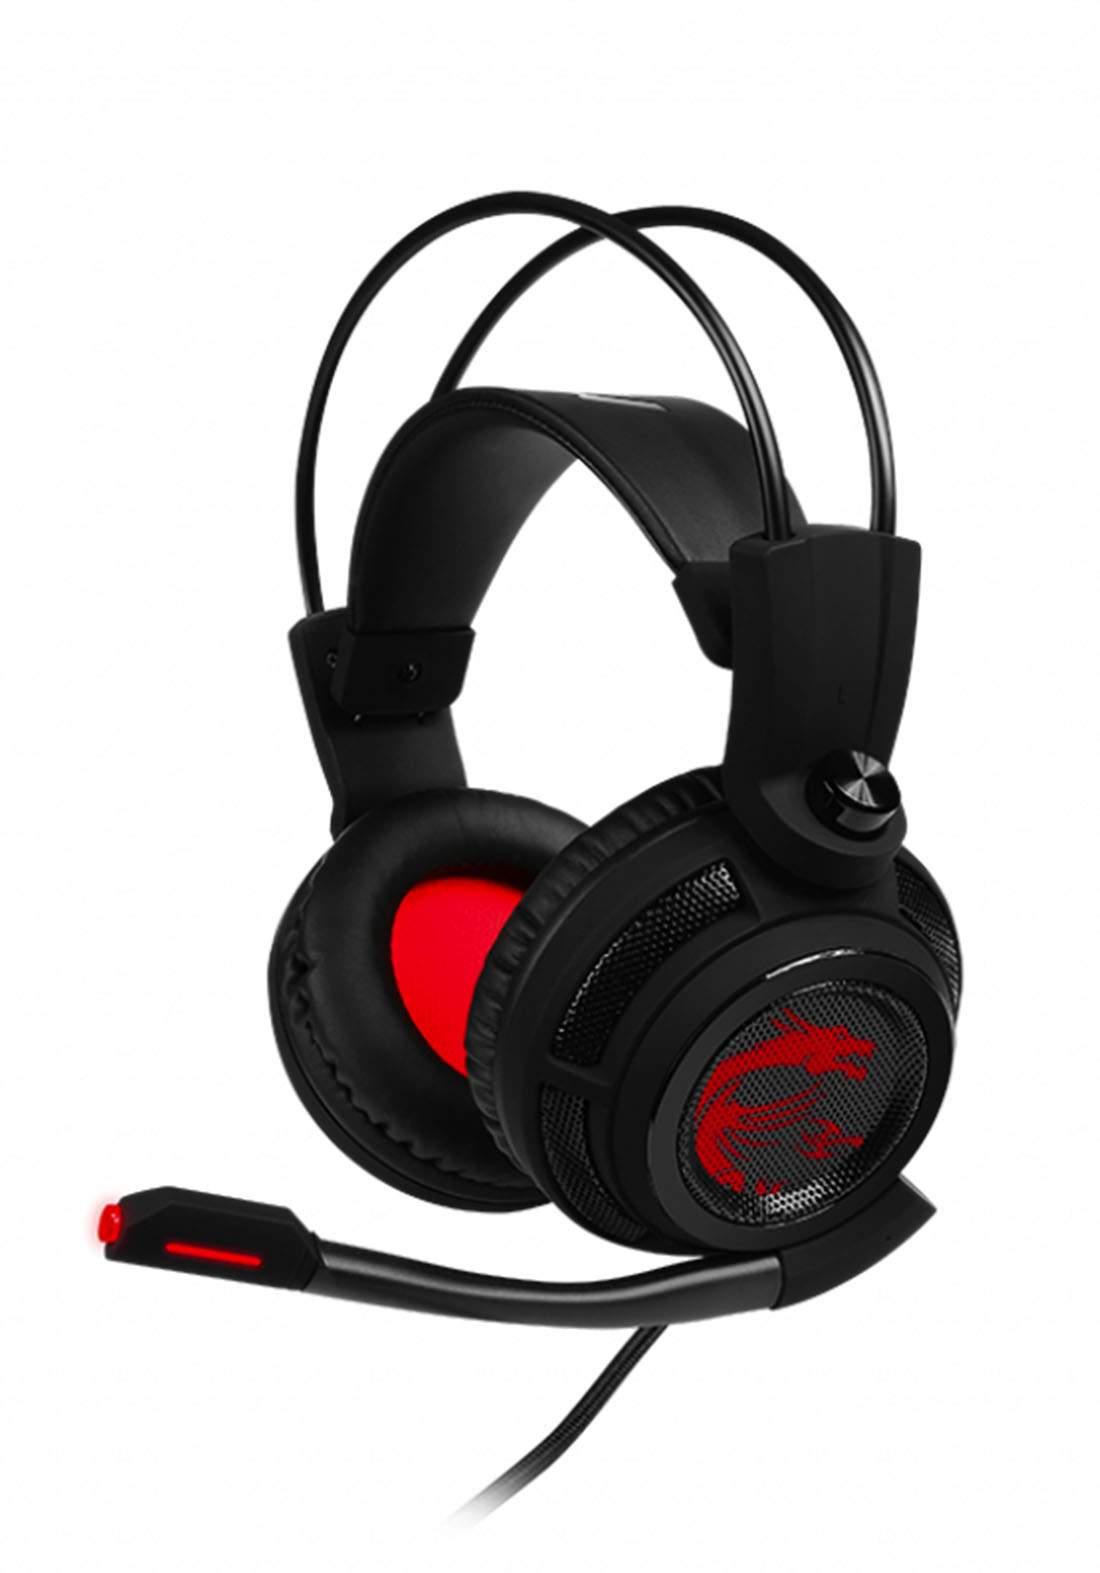 MSI DS502 Wired Gaming Headset - Black سماعة سلكية